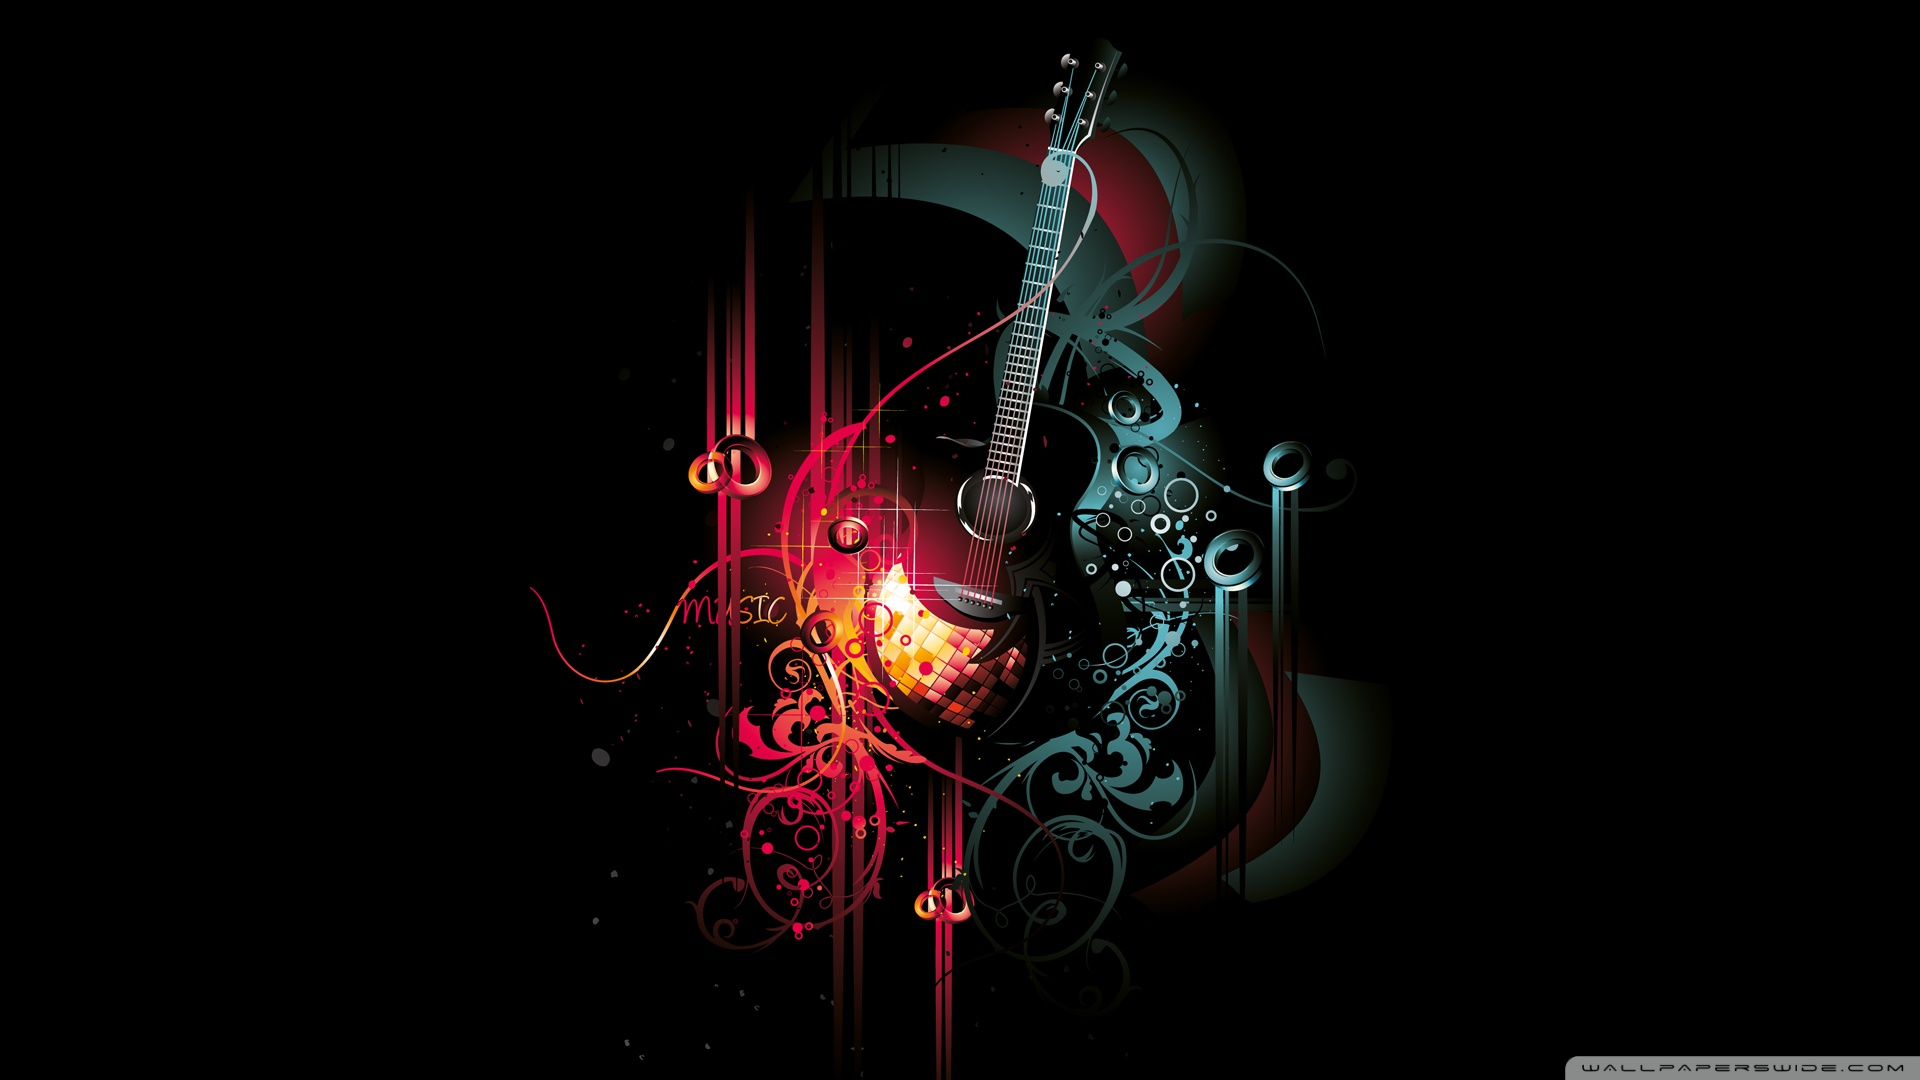 Deadpool Wallpaper Hd 1080p Hd Wallpapers Music Hd Wallpapers For Desktop